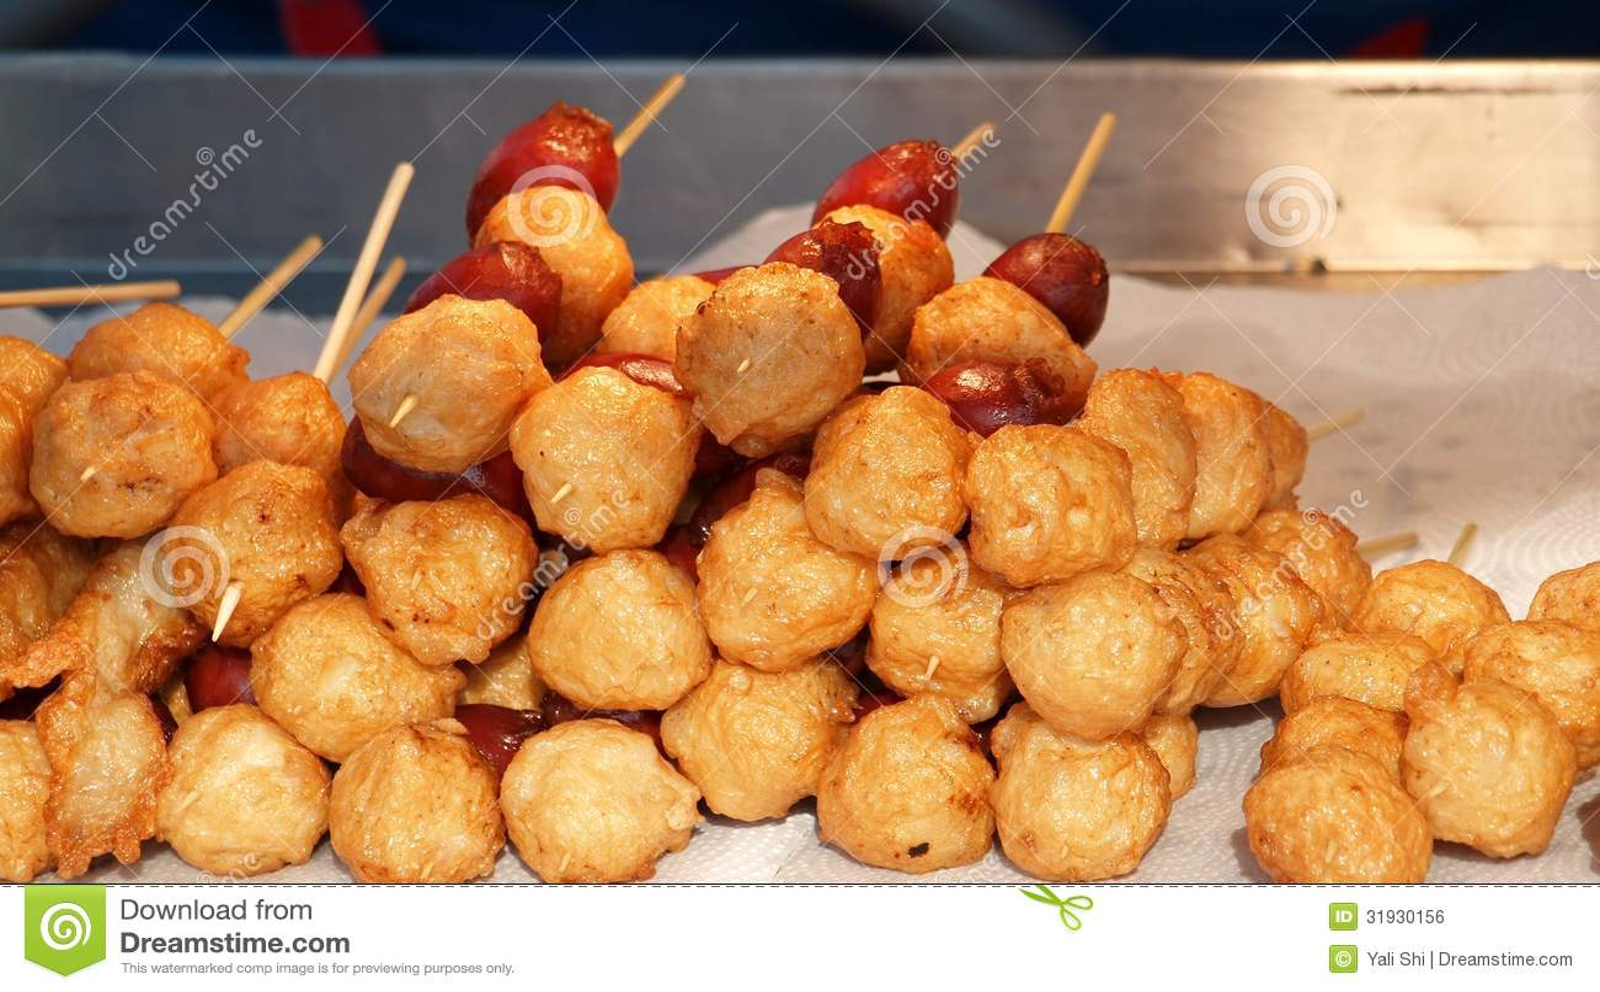 Fried chinese fish balls royalty free stock image image for Chinese fish balls